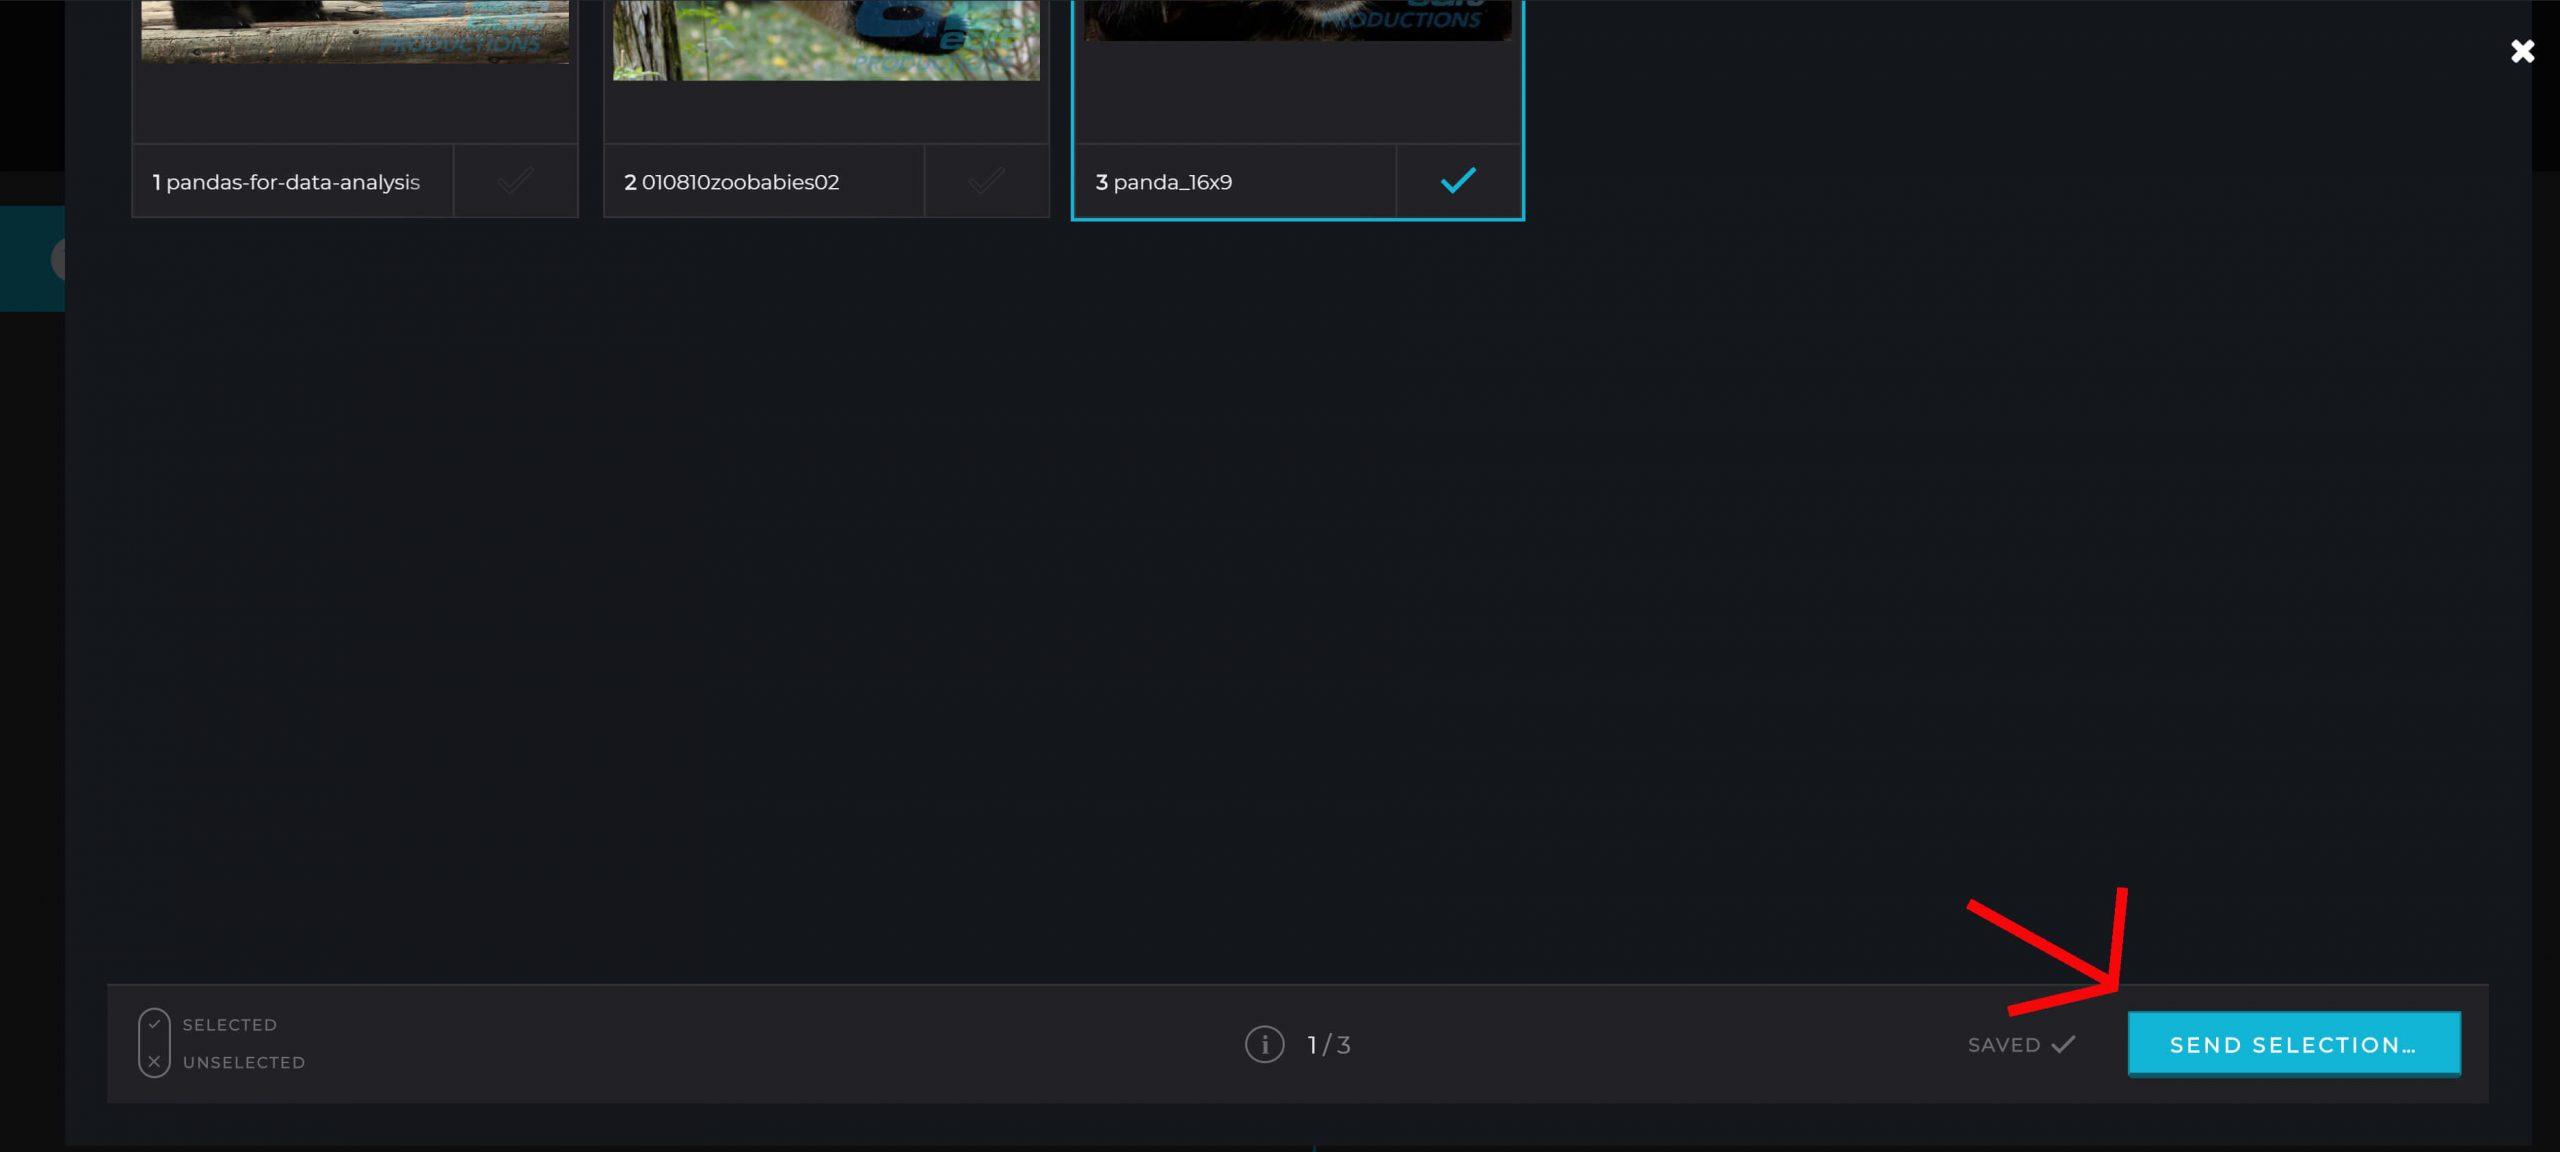 Oseeyo Web Development and Design - Client dashboard screenshot